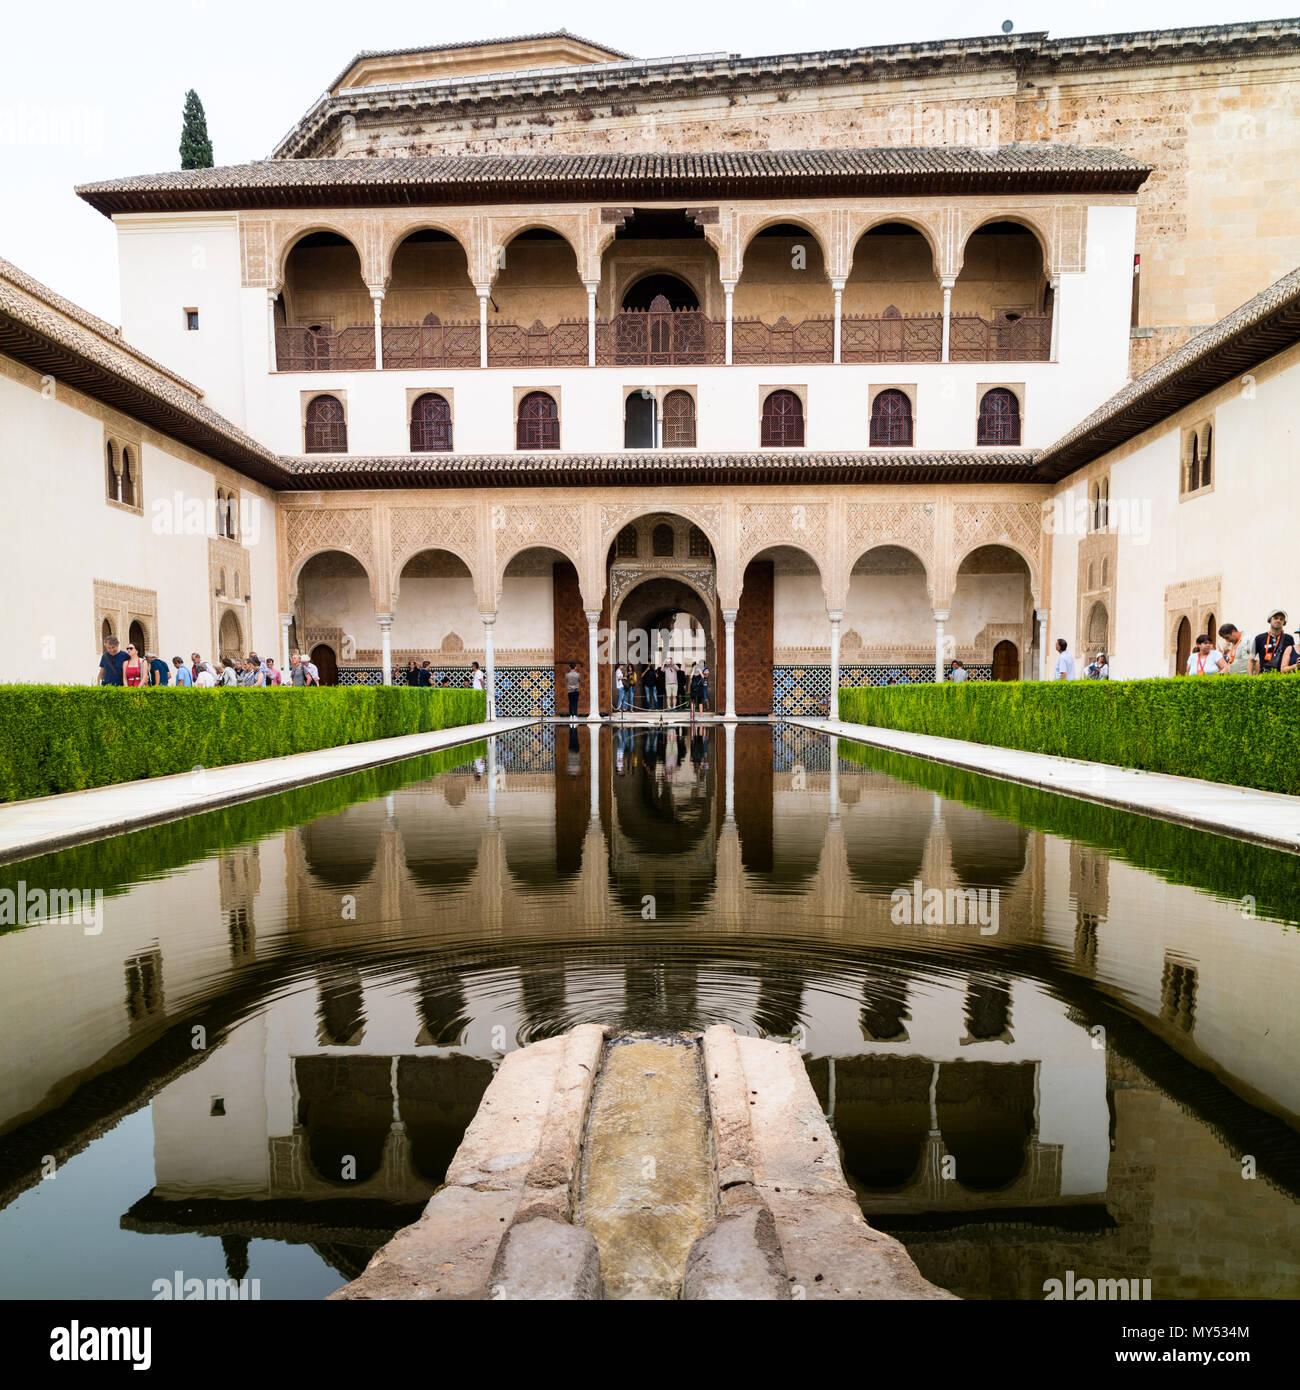 Alhambra Sage Granada Park Alhambra Ca: Alhambra Water Feature Stock Photos & Alhambra Water